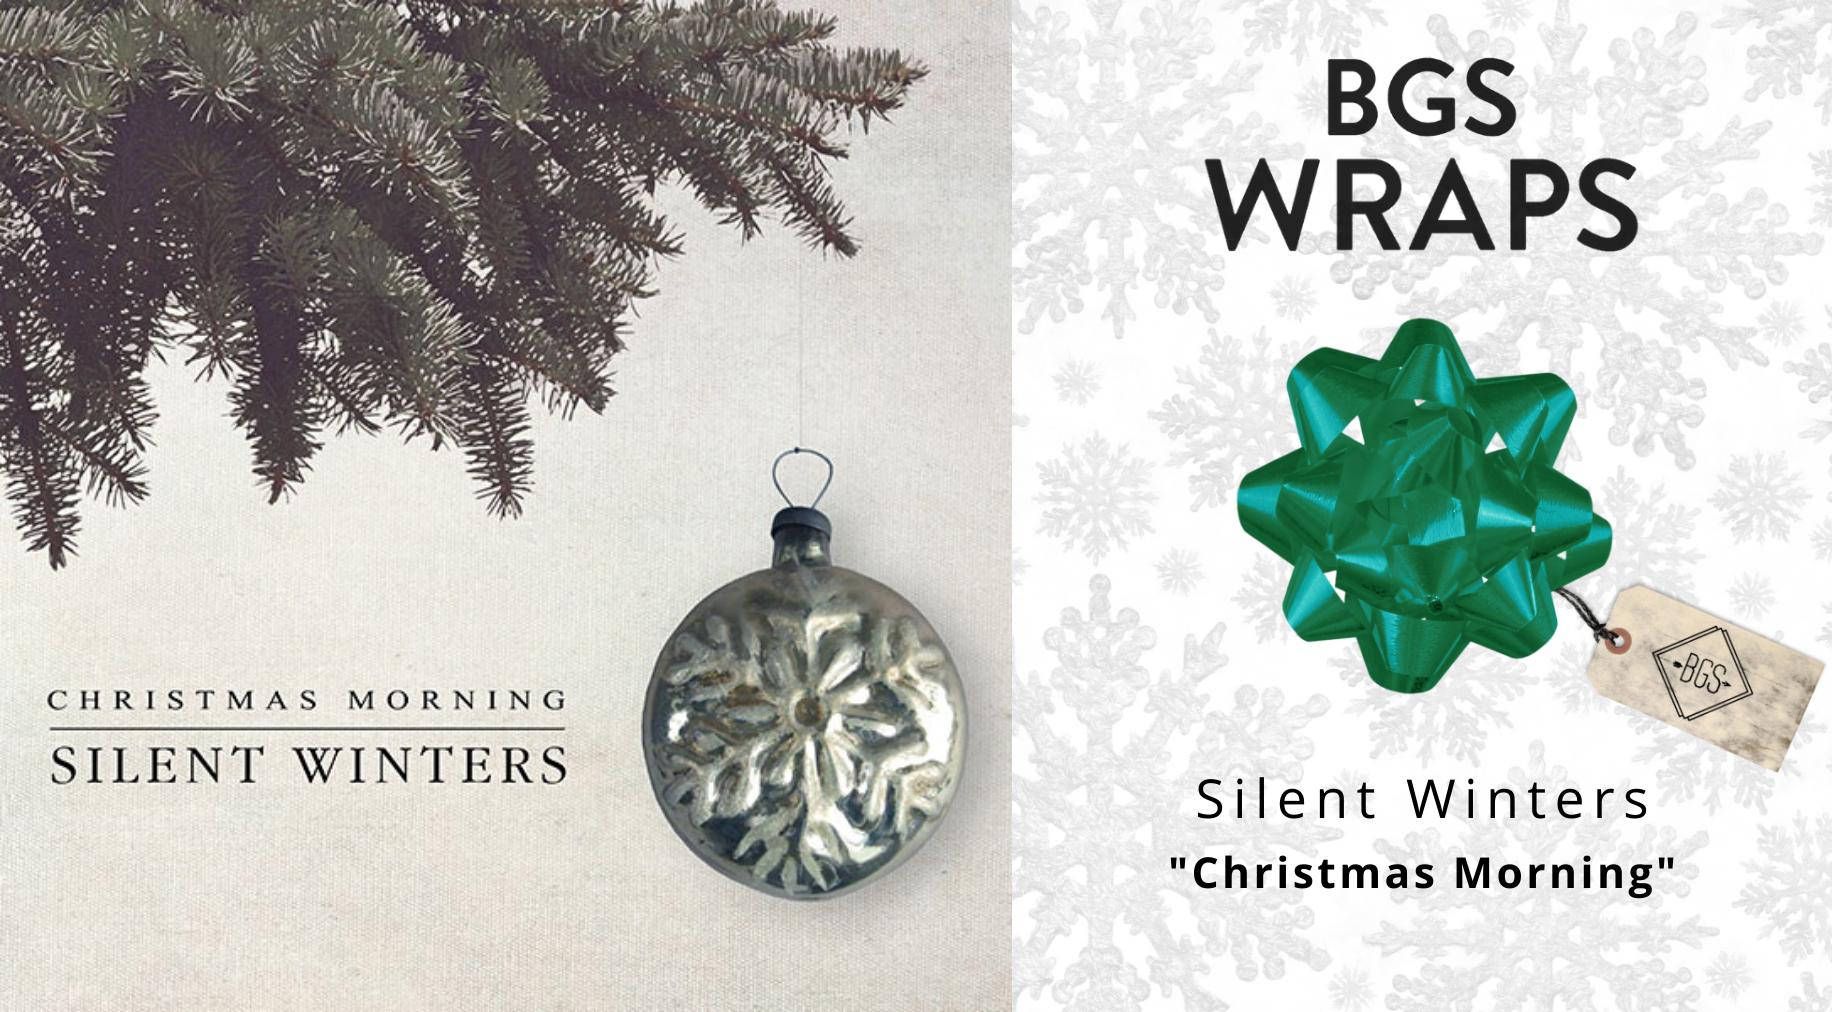 BGS WRAPS: Silent Winters,